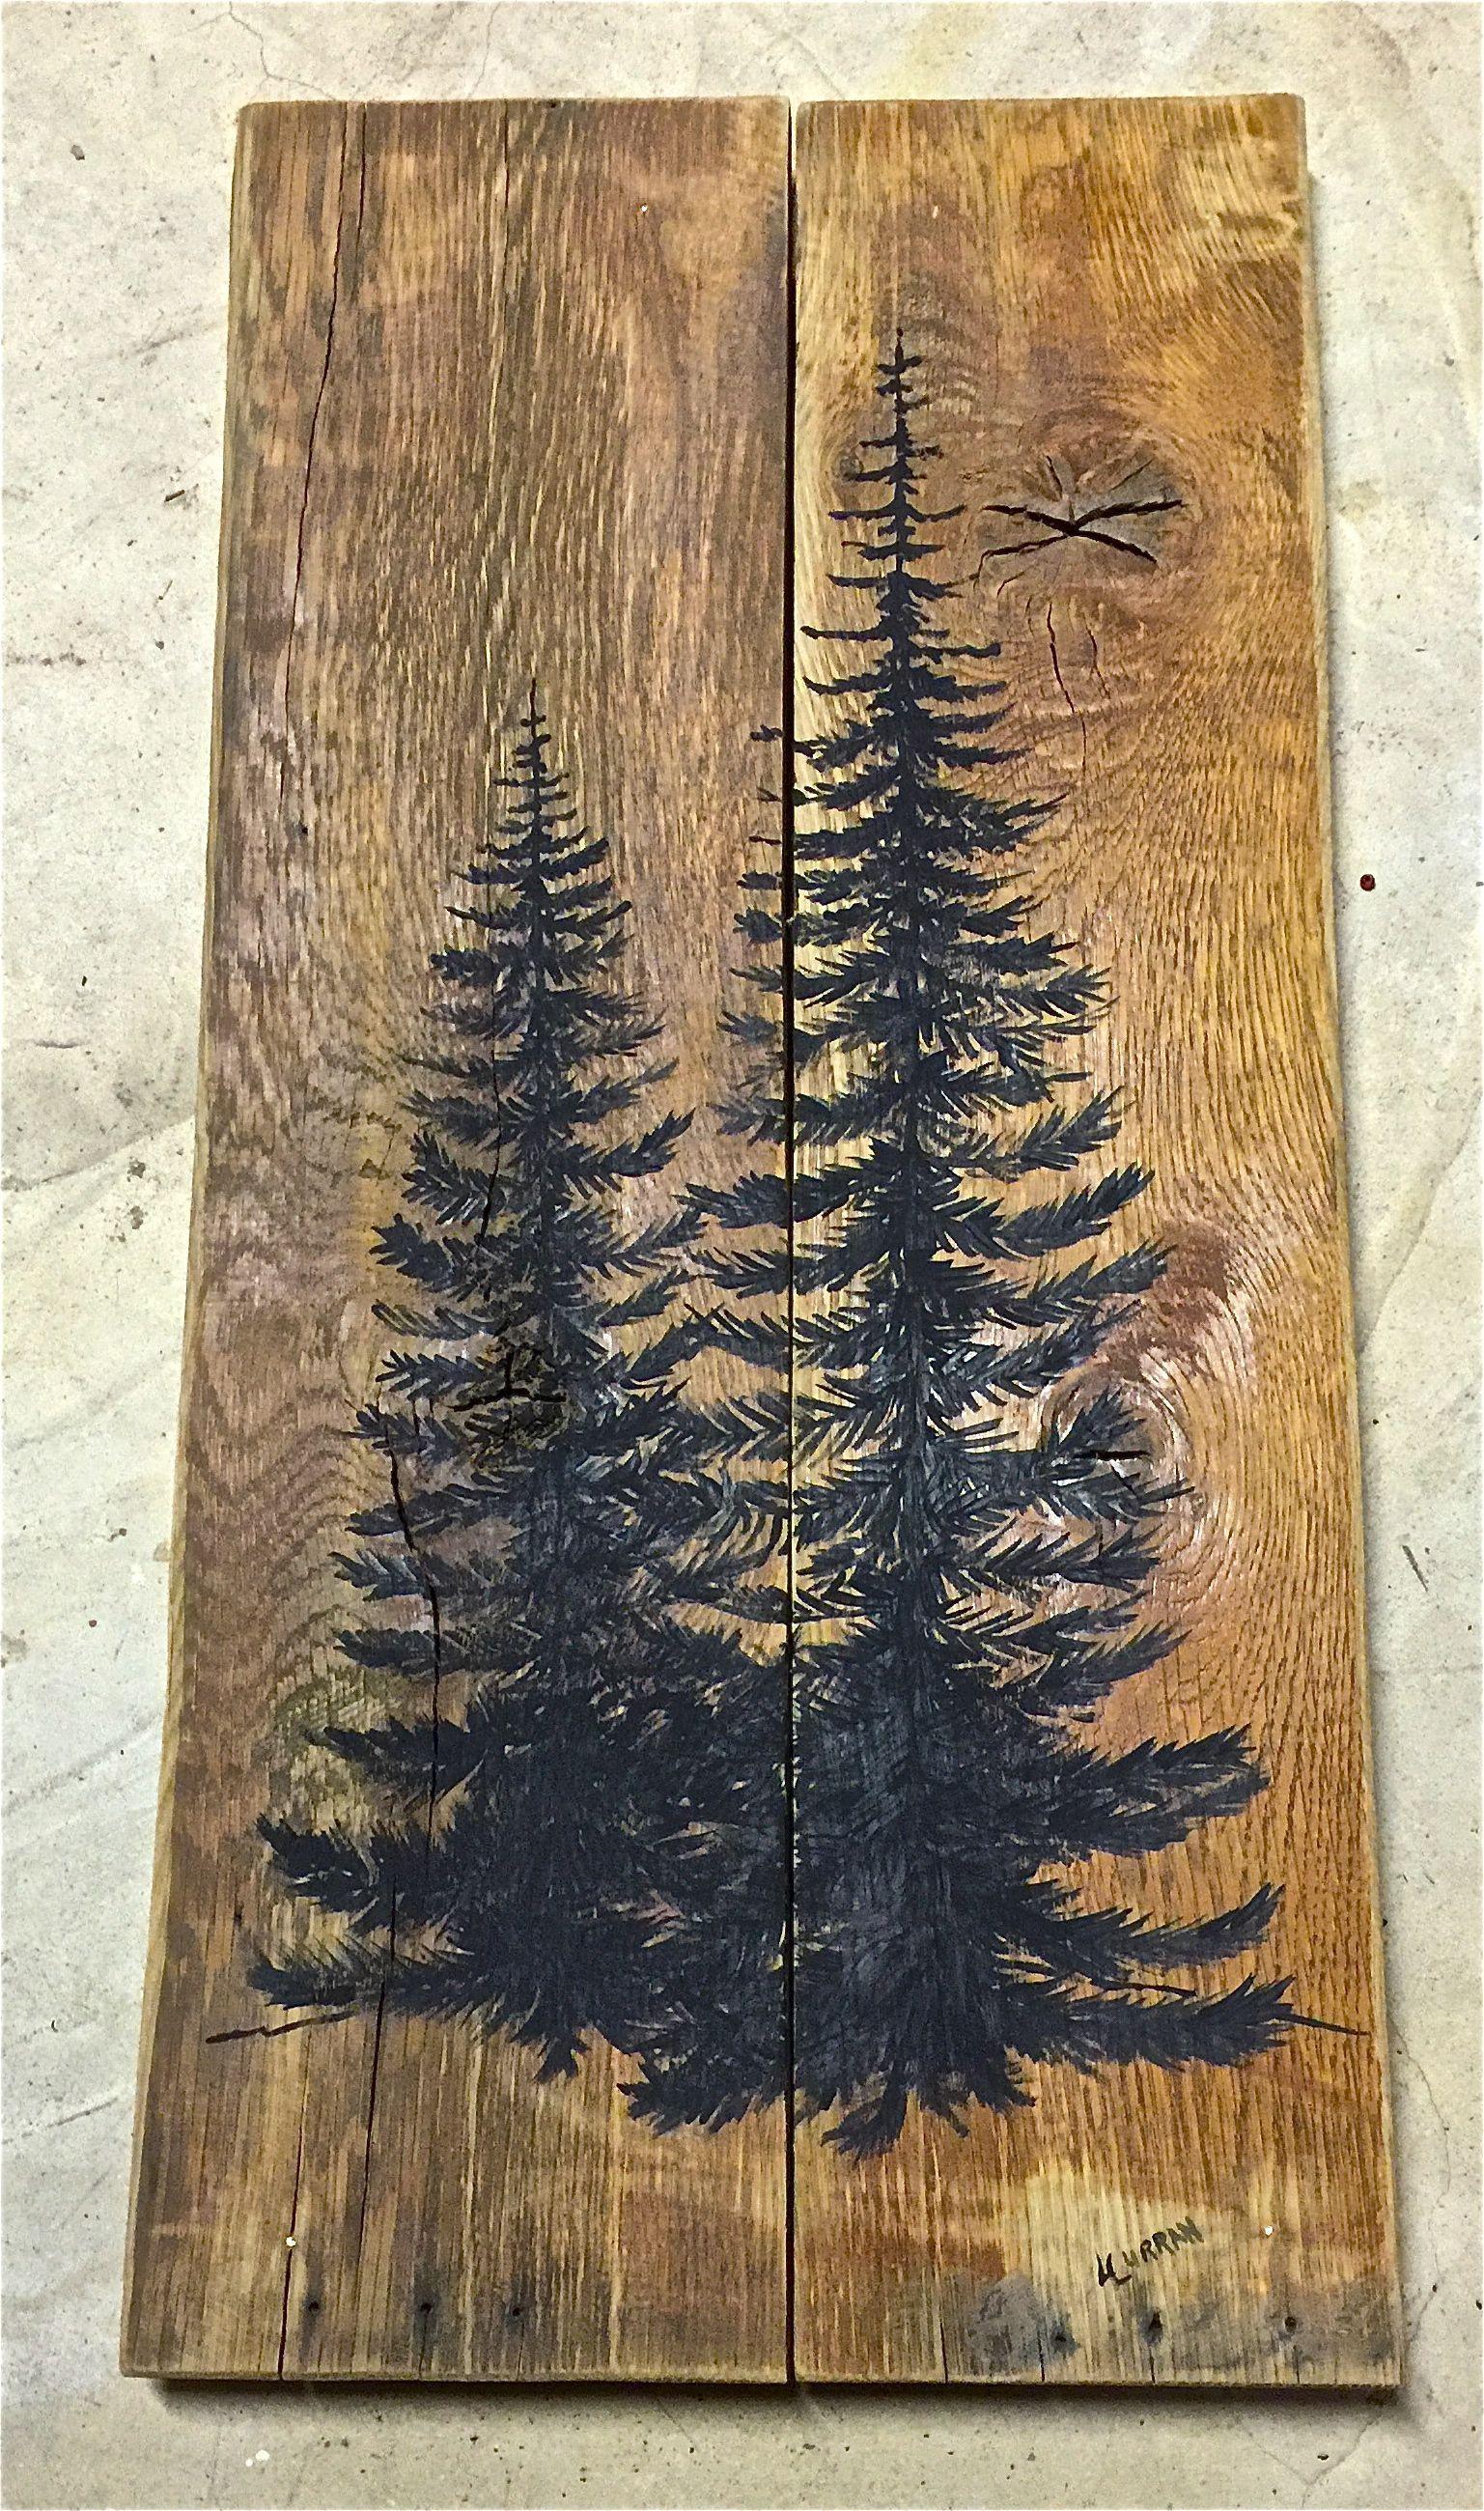 Pin By Alexandra On Bastelideen In 2020 Wood Art Wood Burning Art Wood Burning Crafts